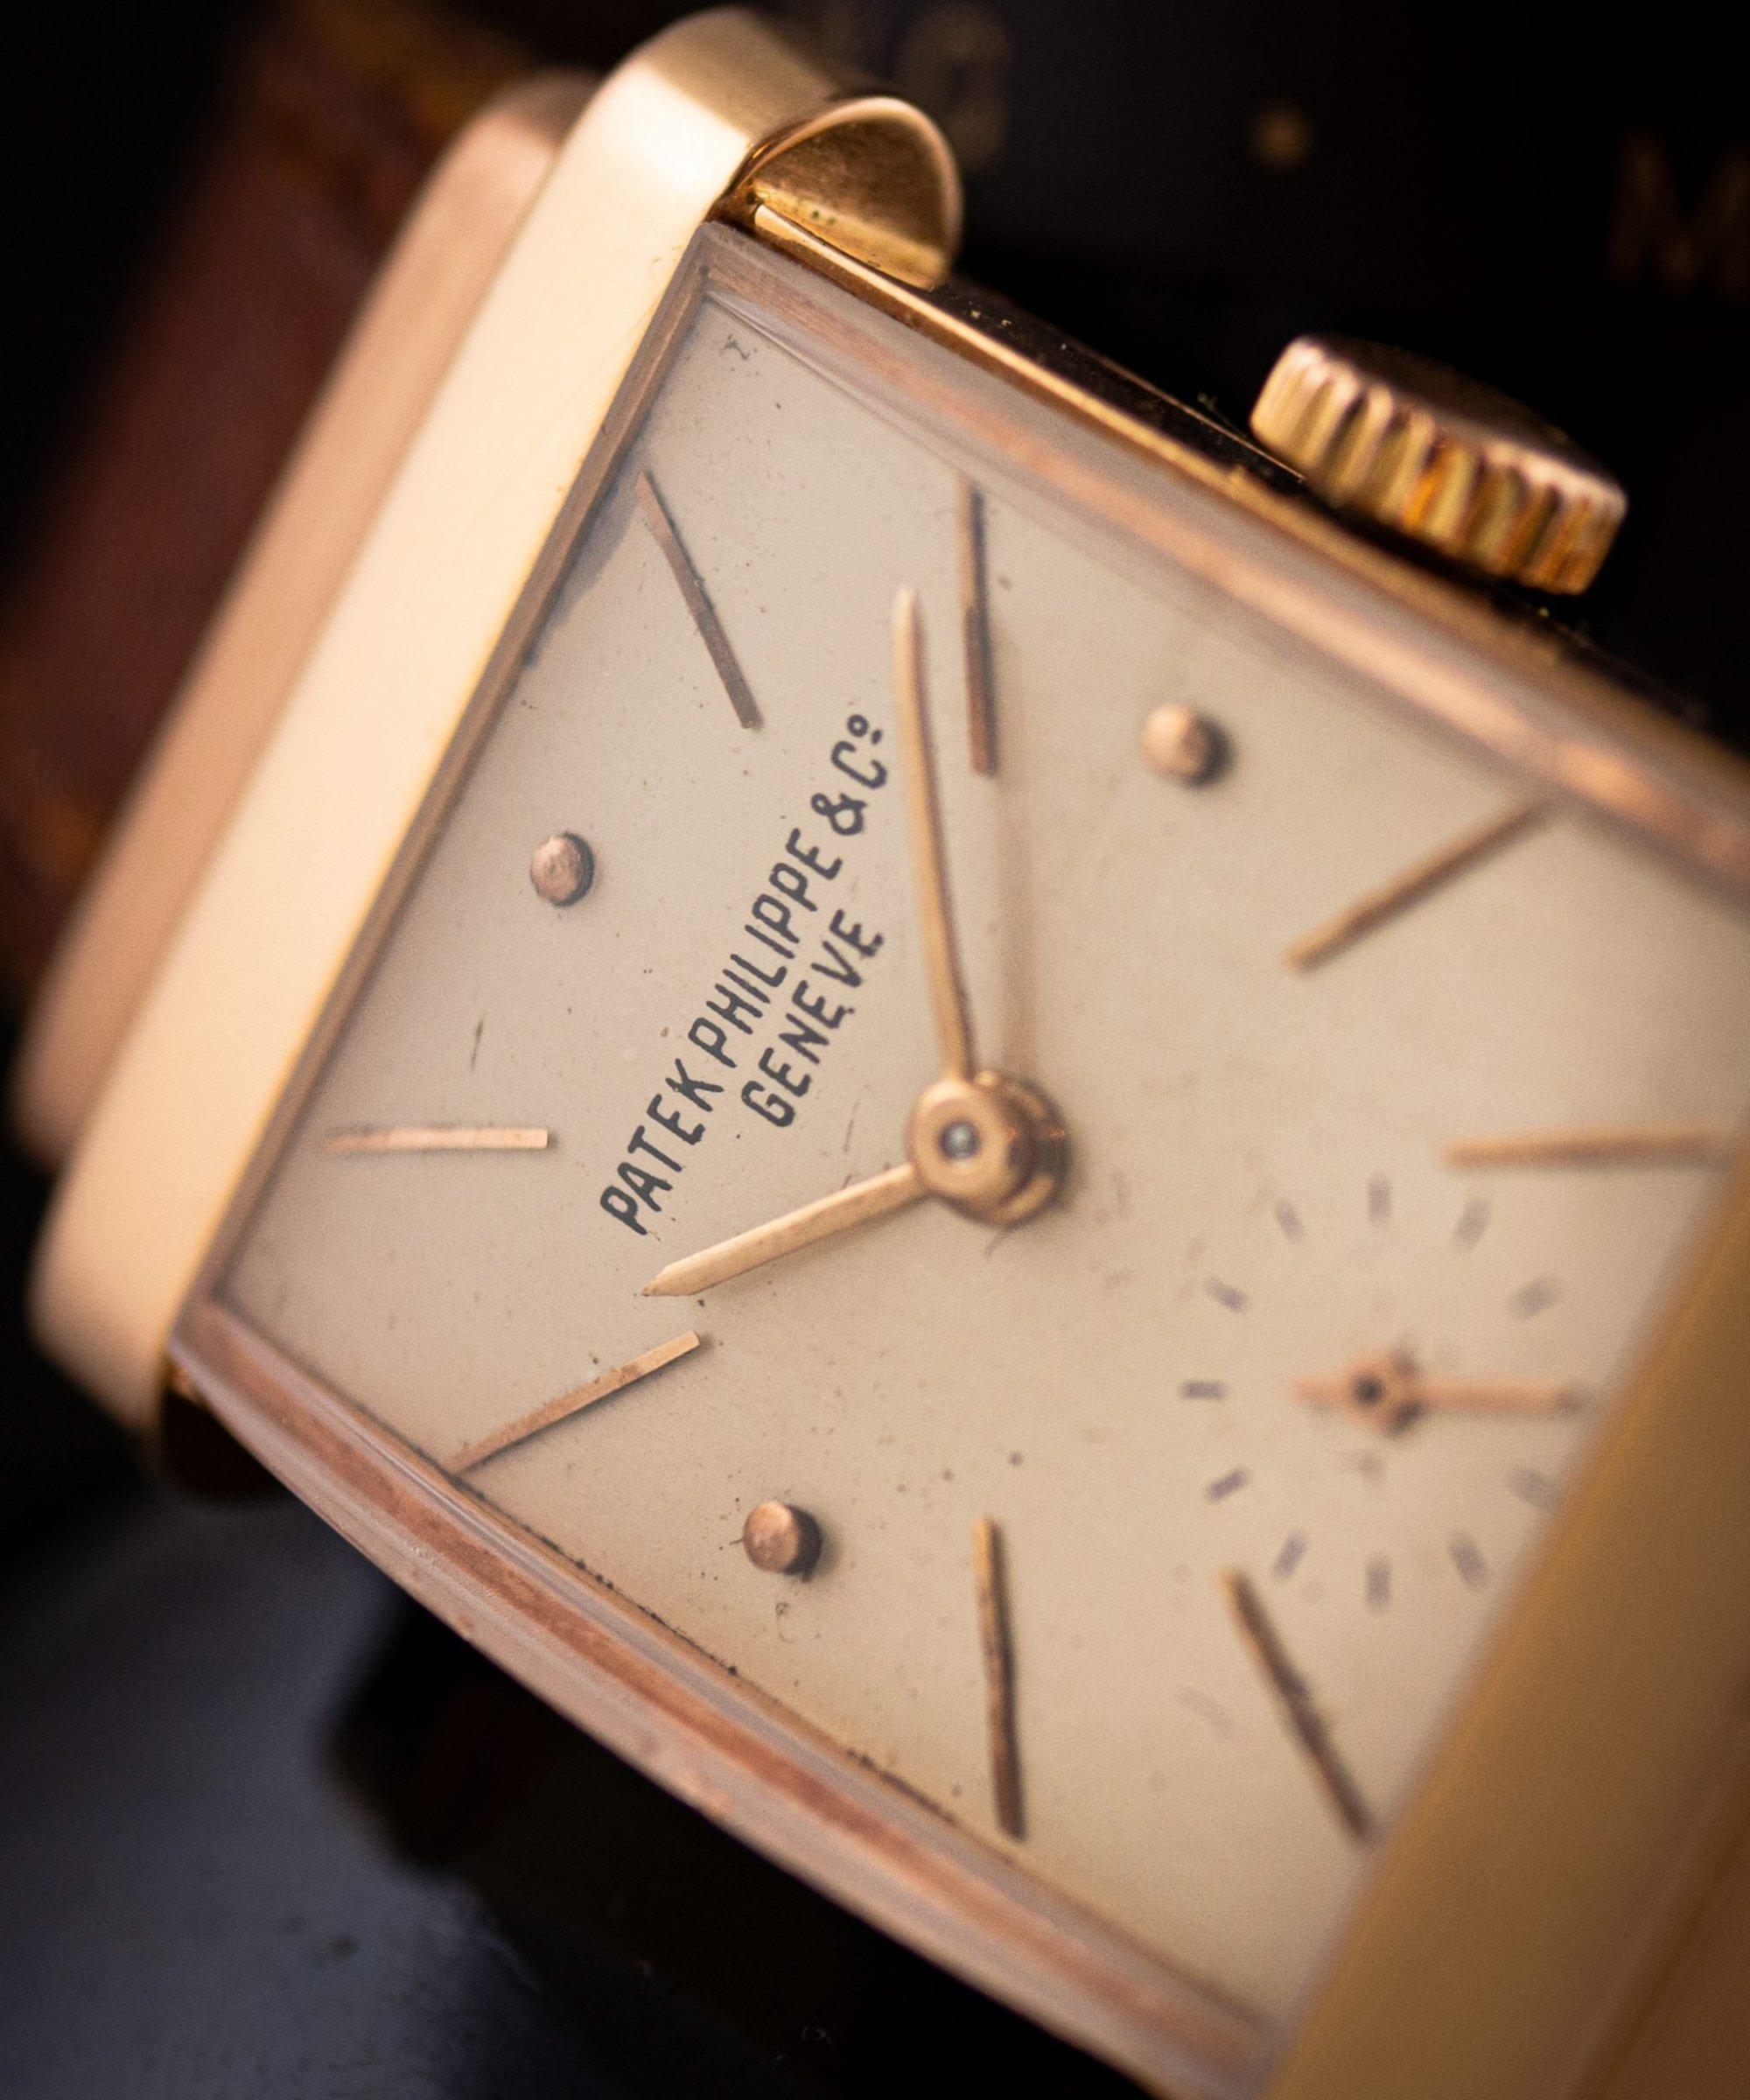 Vintage Patek Philippe Top Hat ref. 1450 18k in rose gold